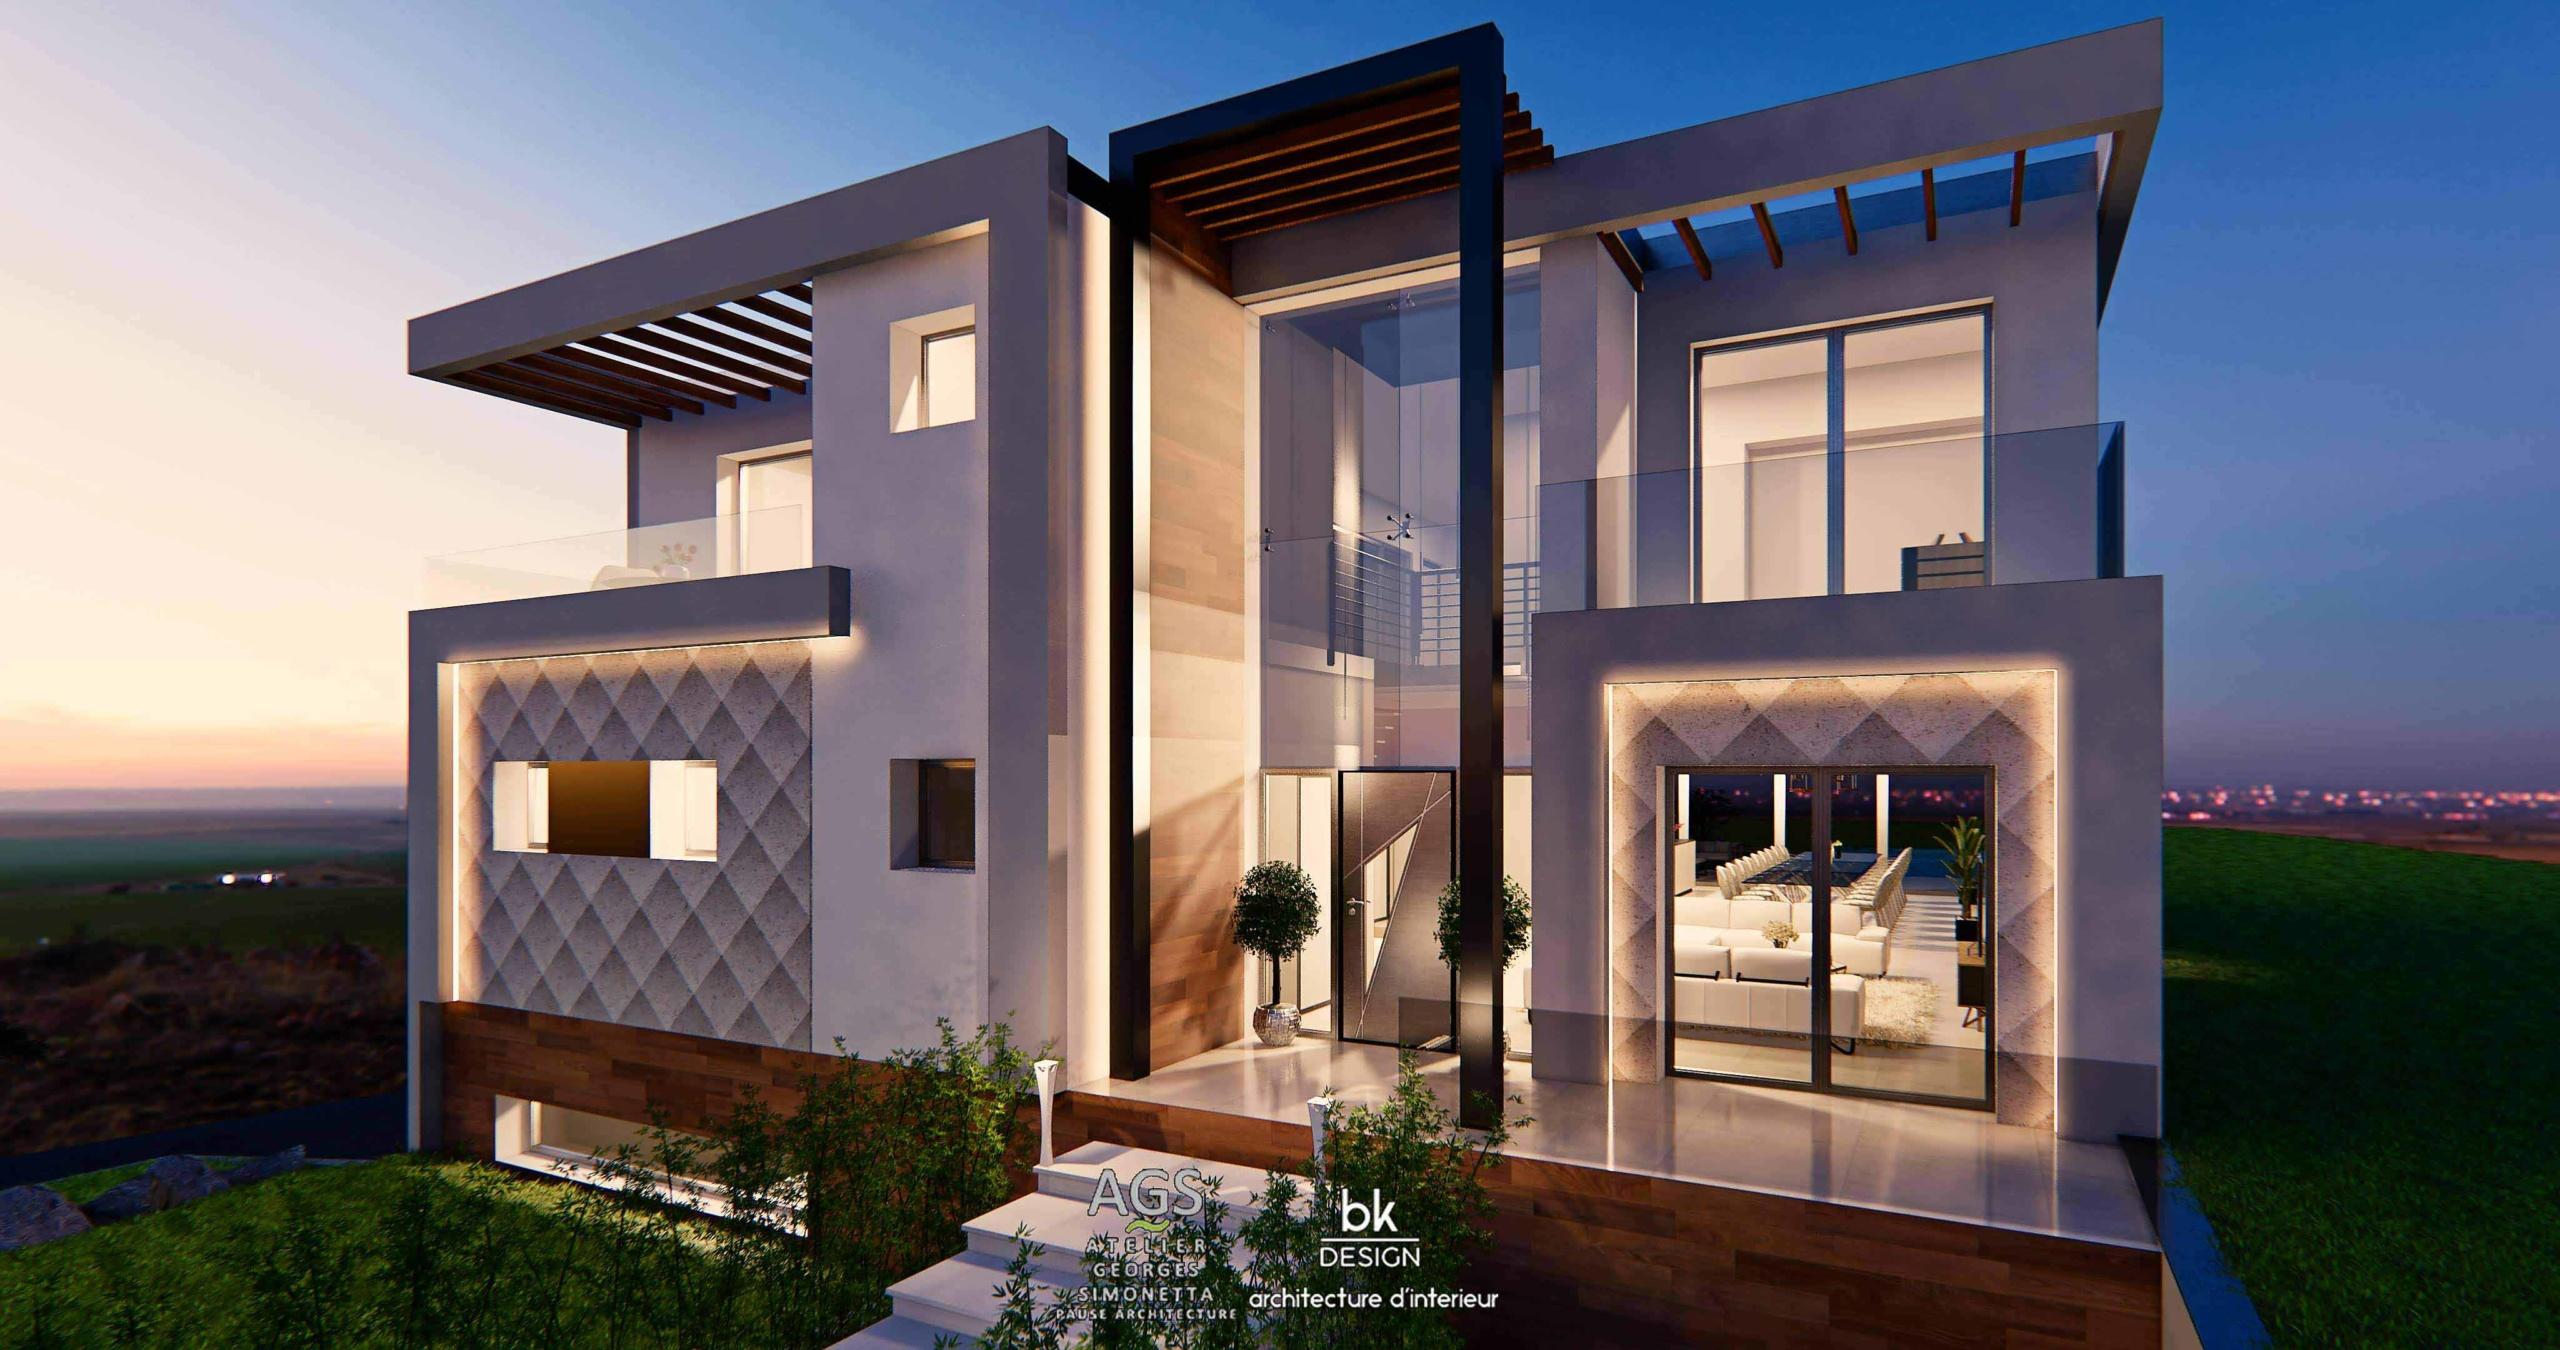 02 bk Design Projet Rombas Villa